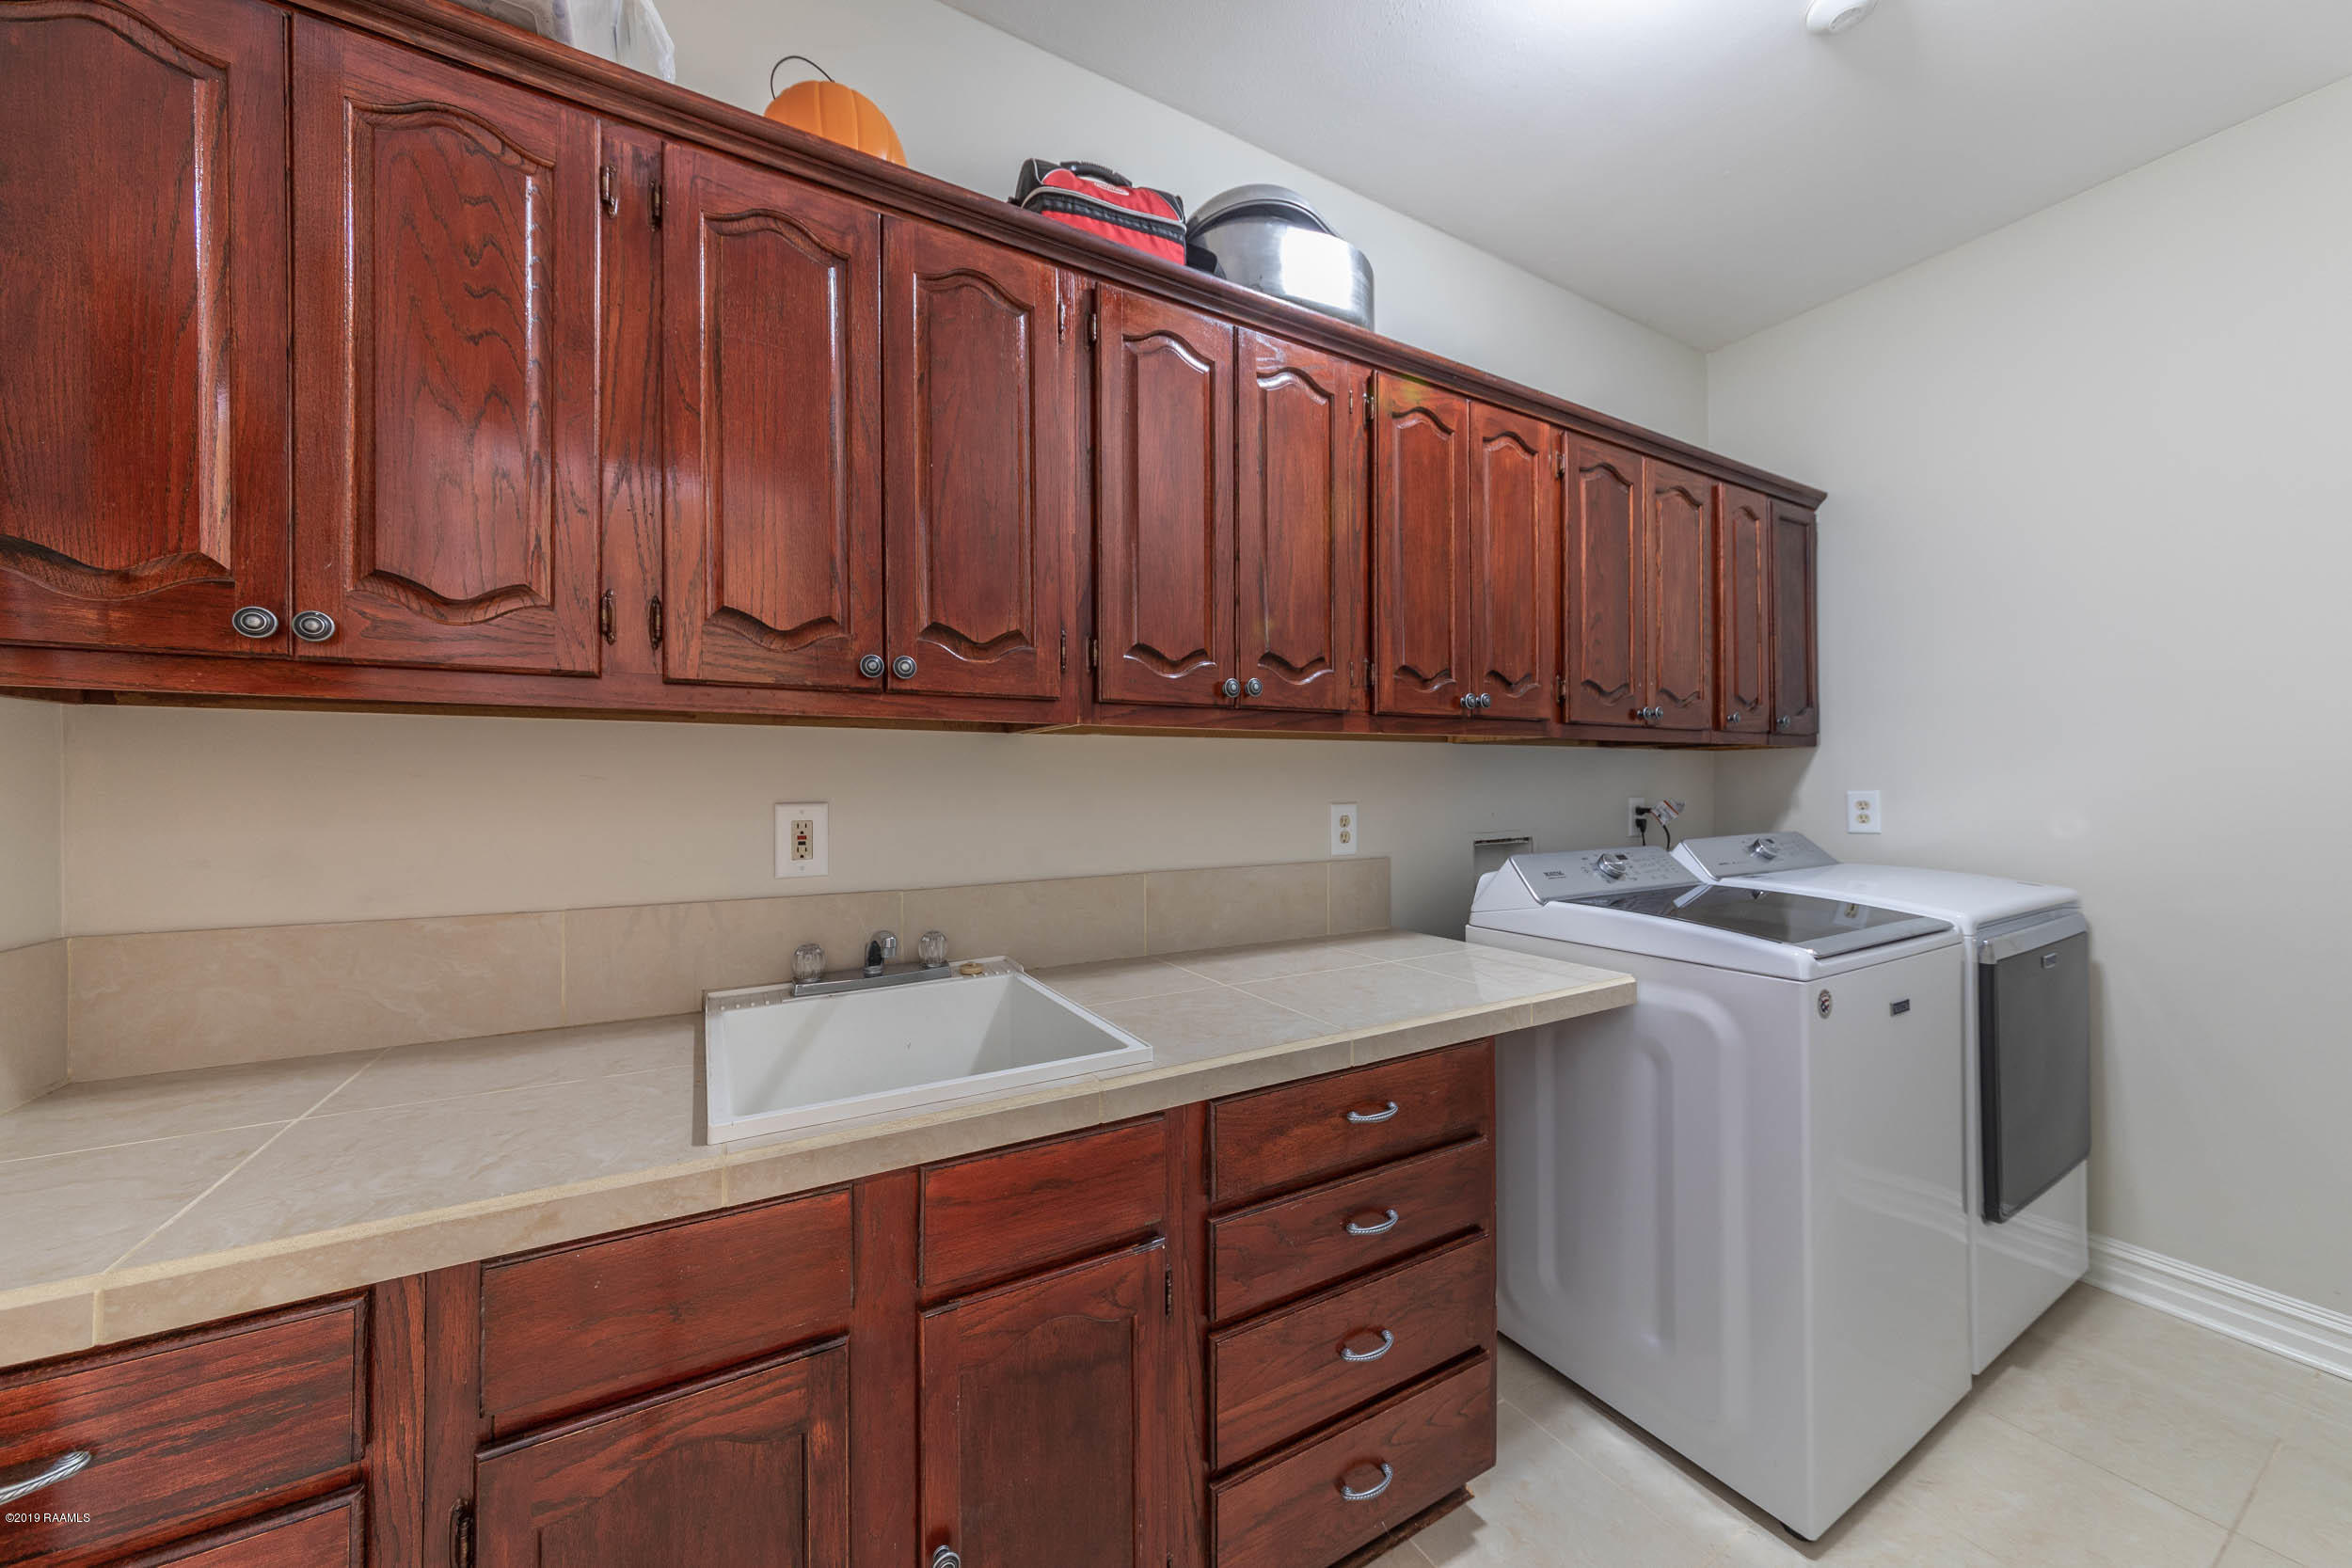 206 Woodrich Lane, Lafayette, LA 70507 Photo #26